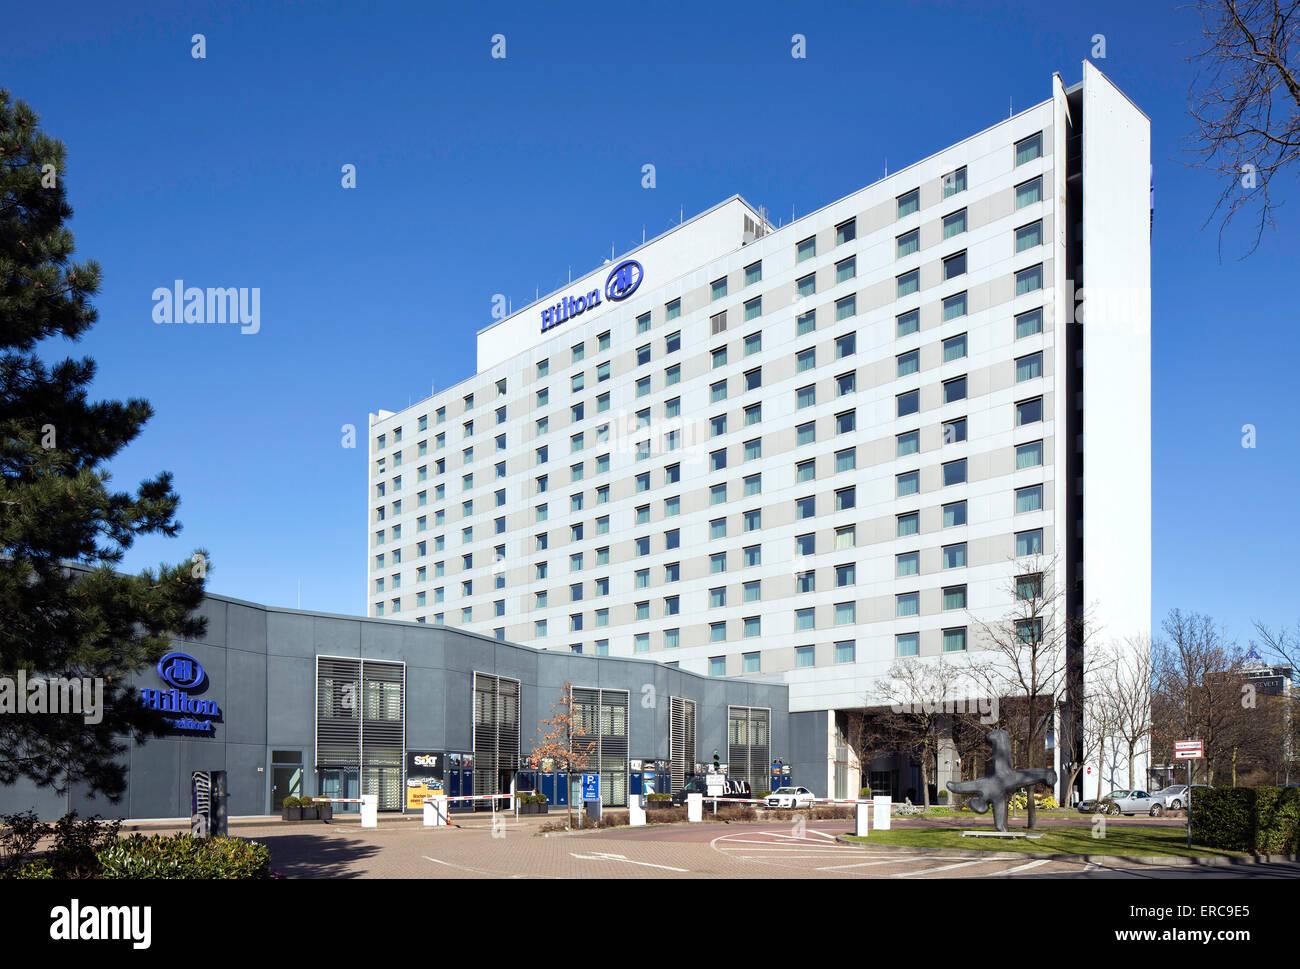 Hilton Hotel and Conference Centre, Düsseldorf, Rhineland, North Rhine-Westphalia, Germany - Stock Image